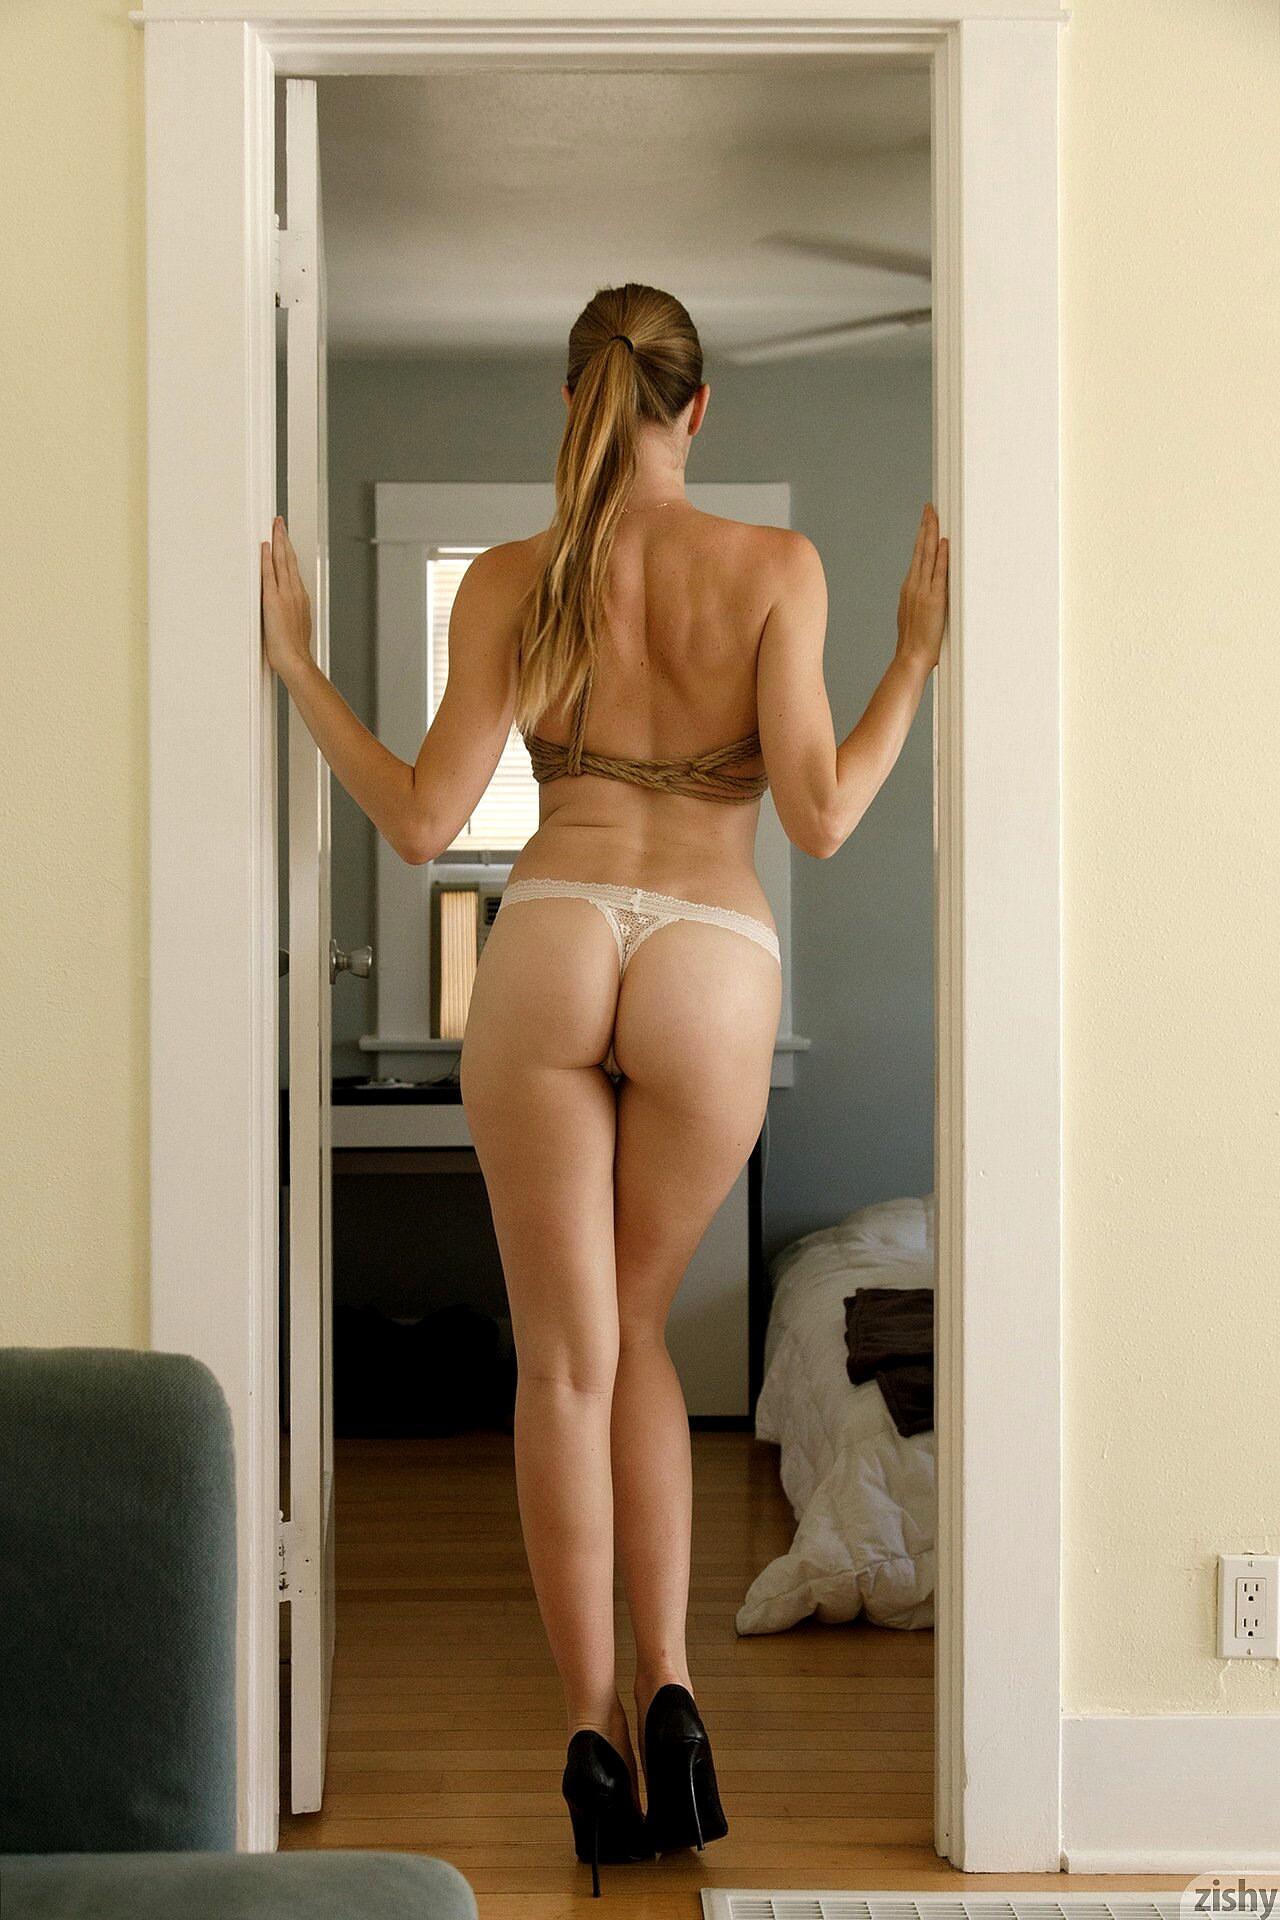 Amazon Porn Position Amateur analhdpics amateur porn tube! ashley lane rope on amazon